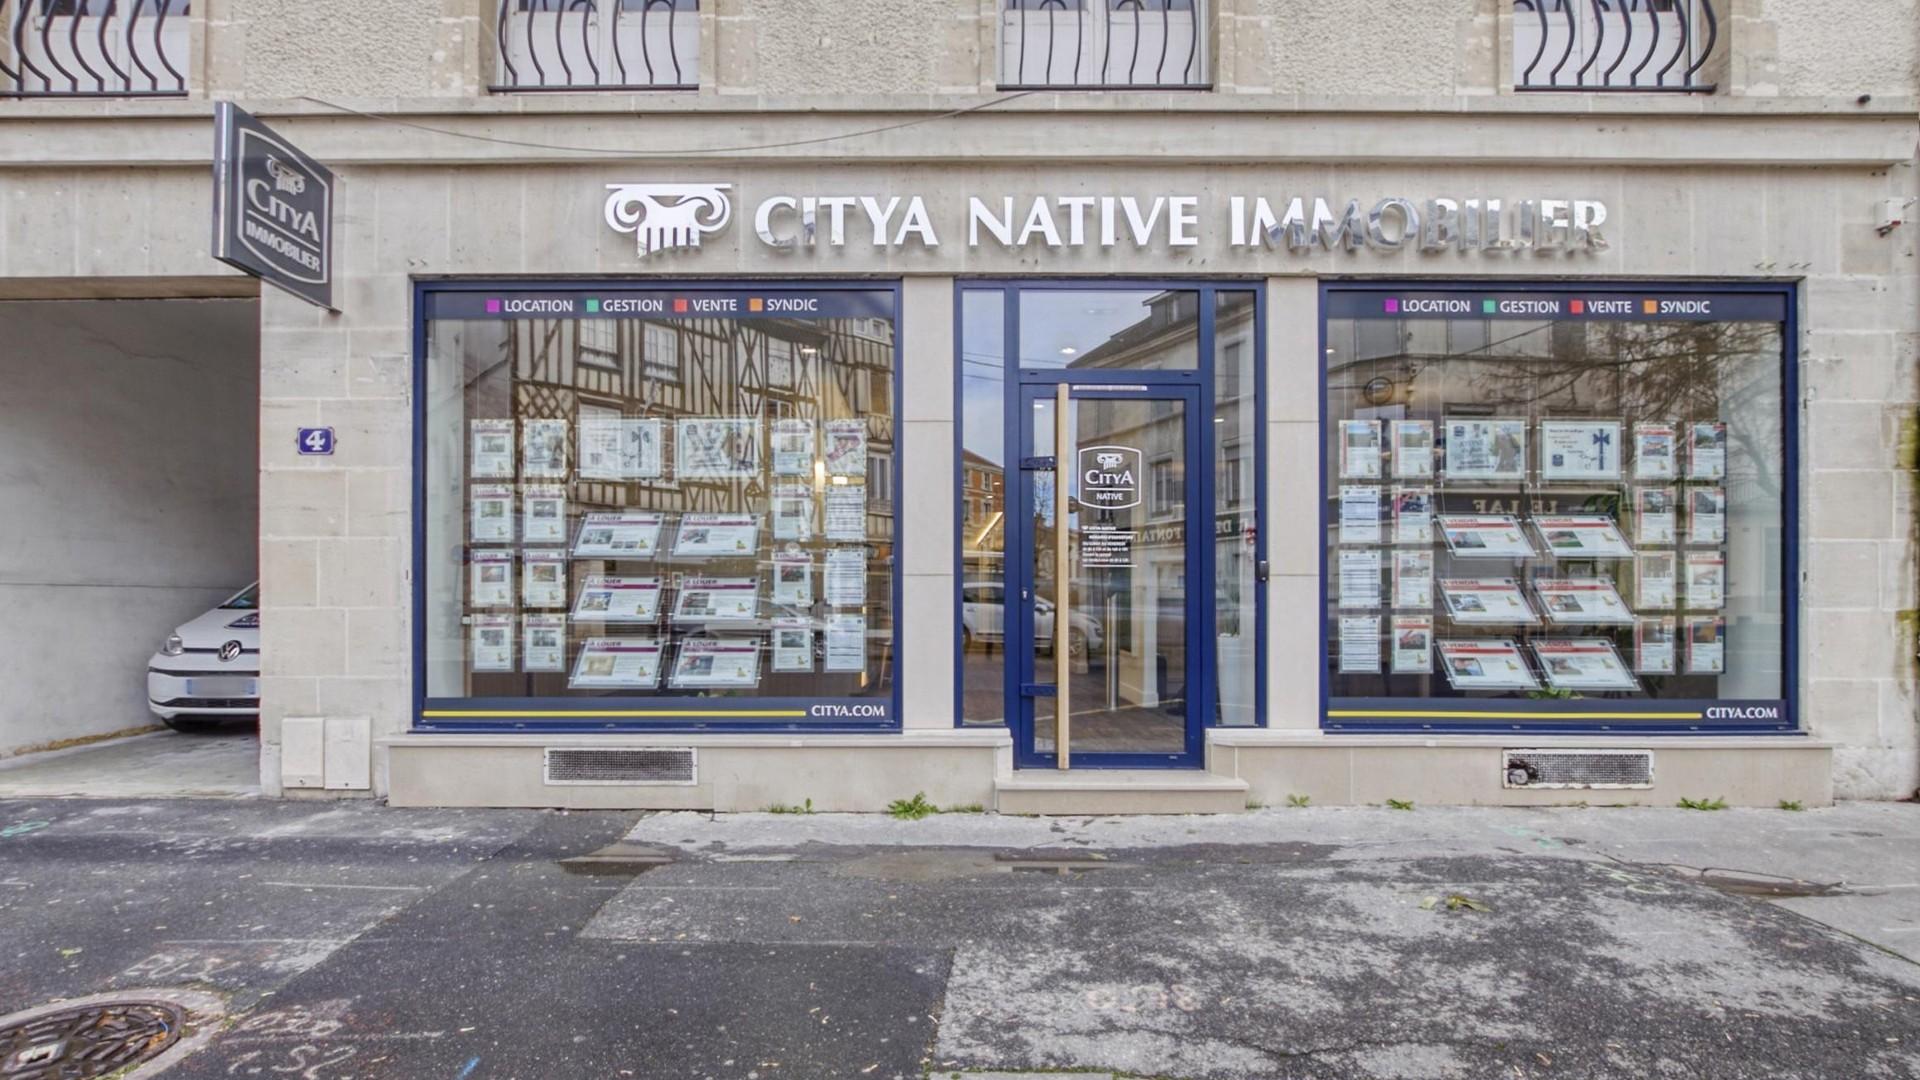 Agence immo Citya Native Chalons-en-Champagne